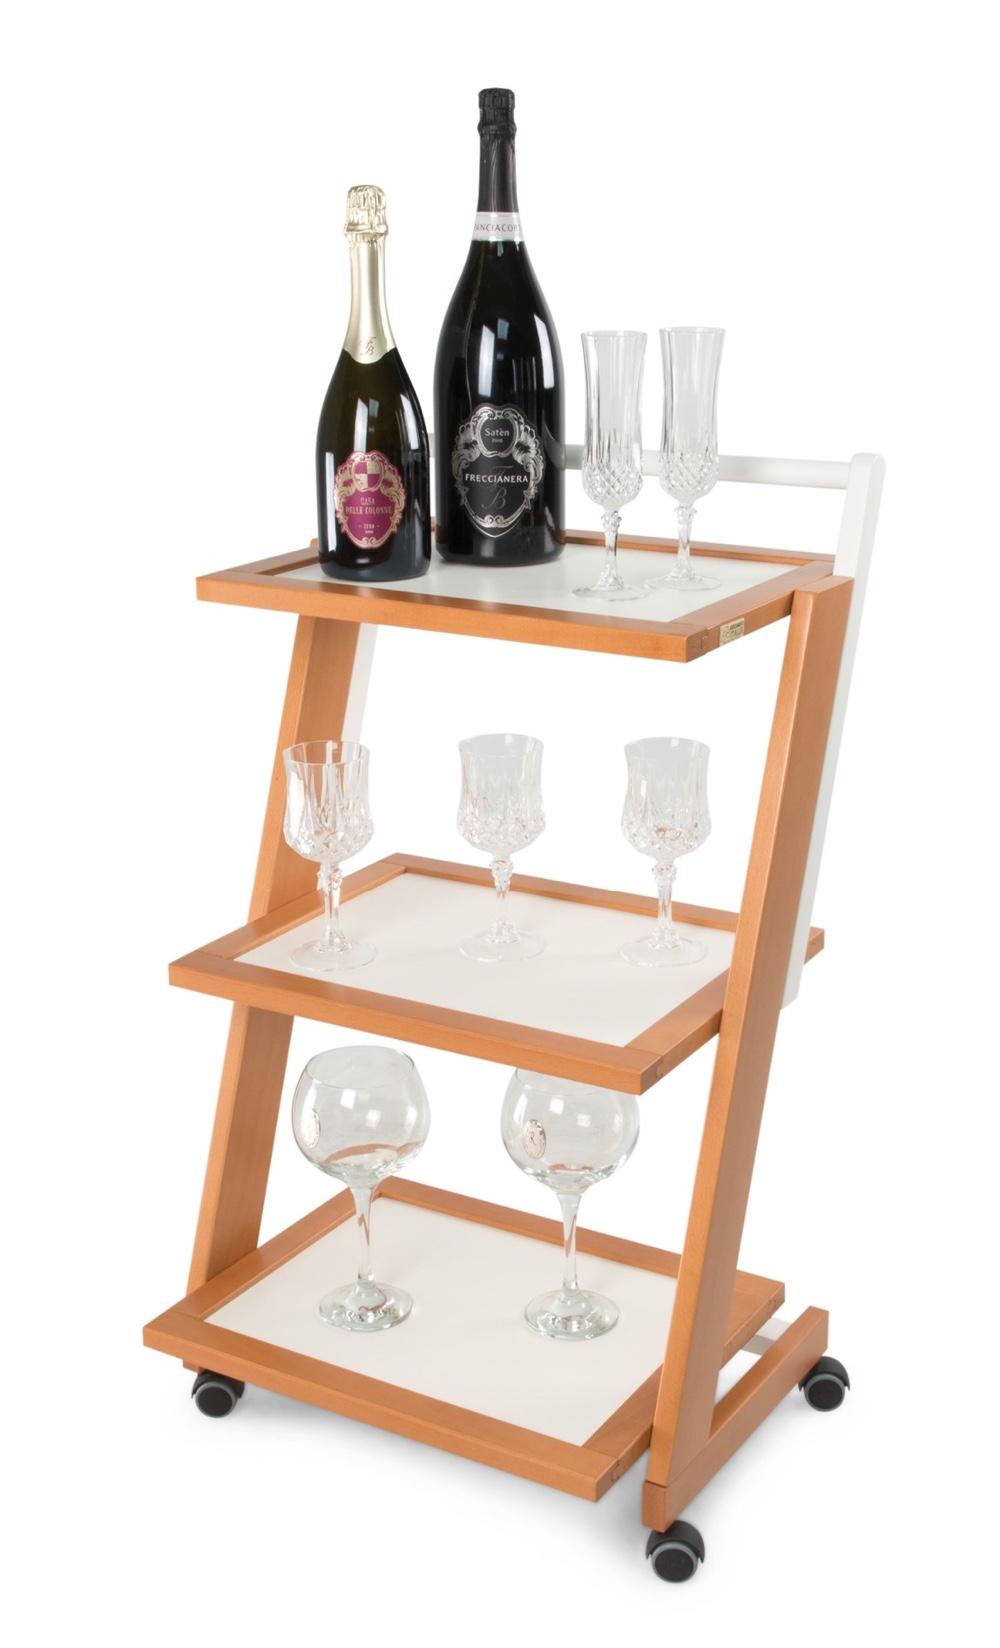 In Legno Wood Design serving trolley arredamenti italia zordan,wood - design - 3